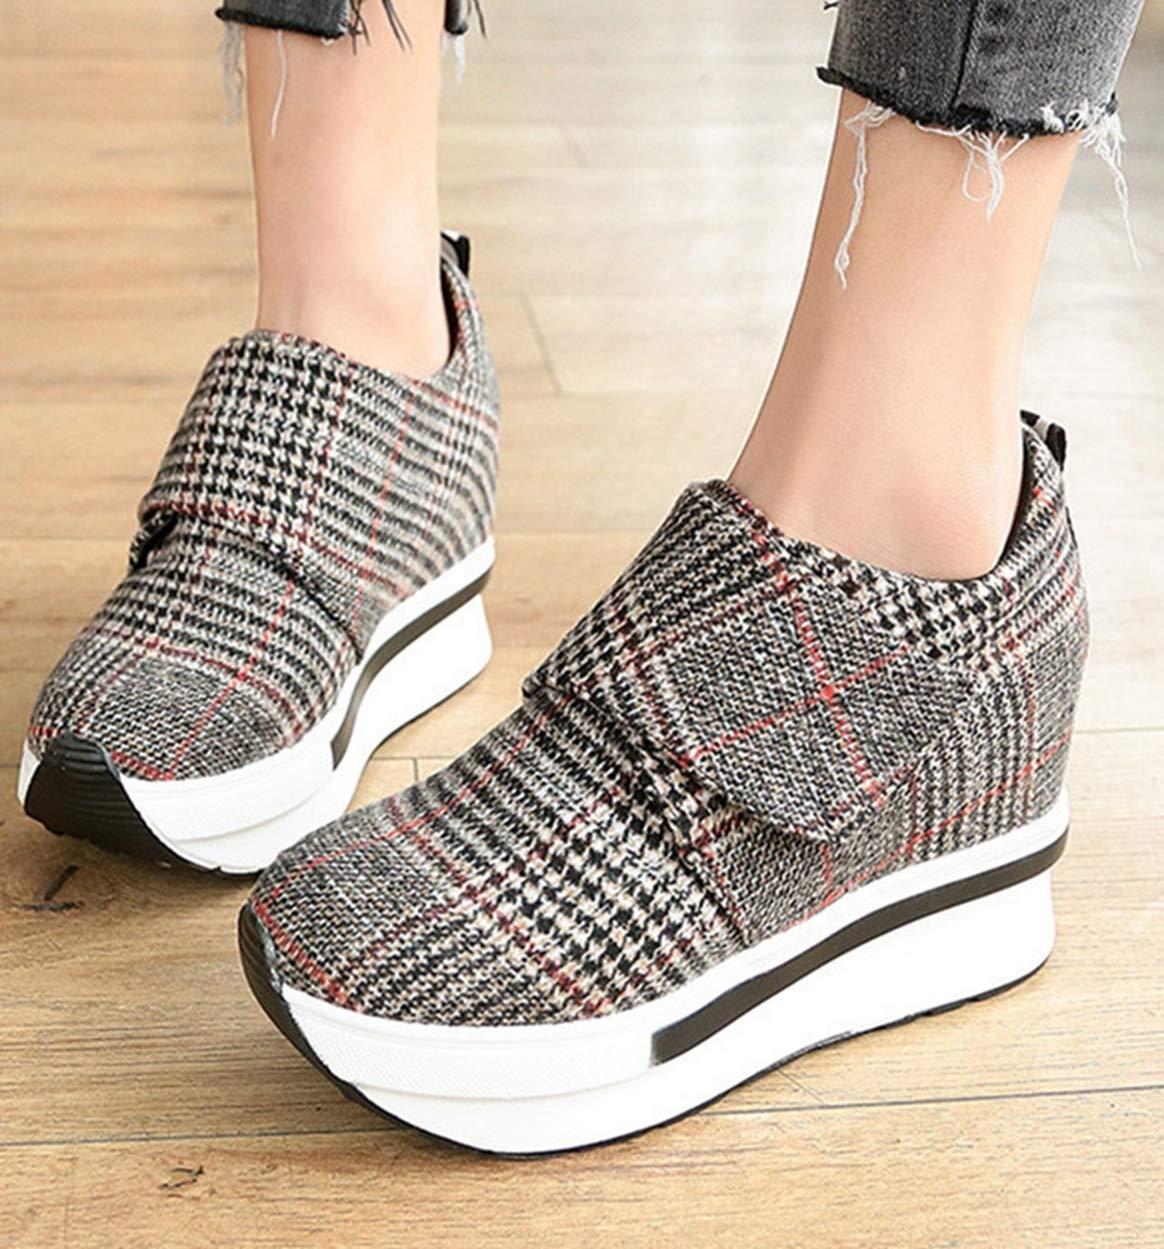 NEW Casual Women/'s High Heels Platform Hidden Wedge Ankle Sneakers Walking Shoes